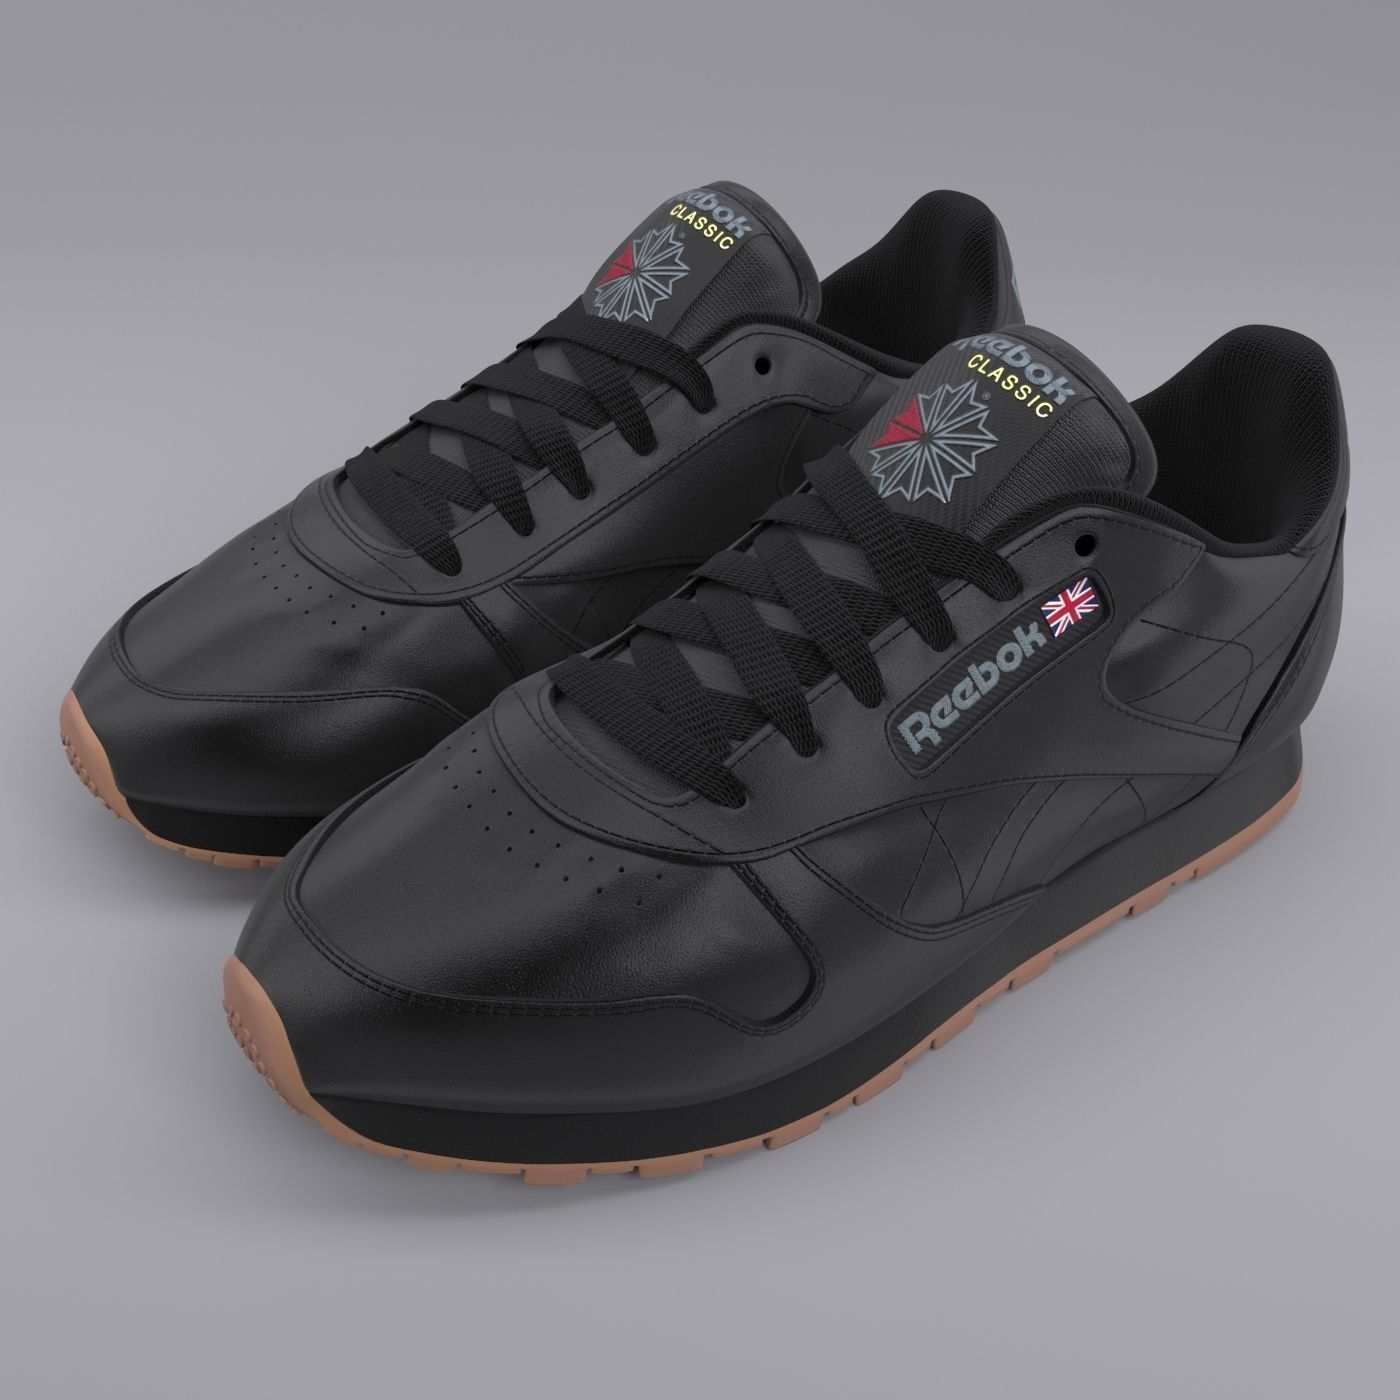 Reebok Classic Leather Black Gum PBR | 3D model